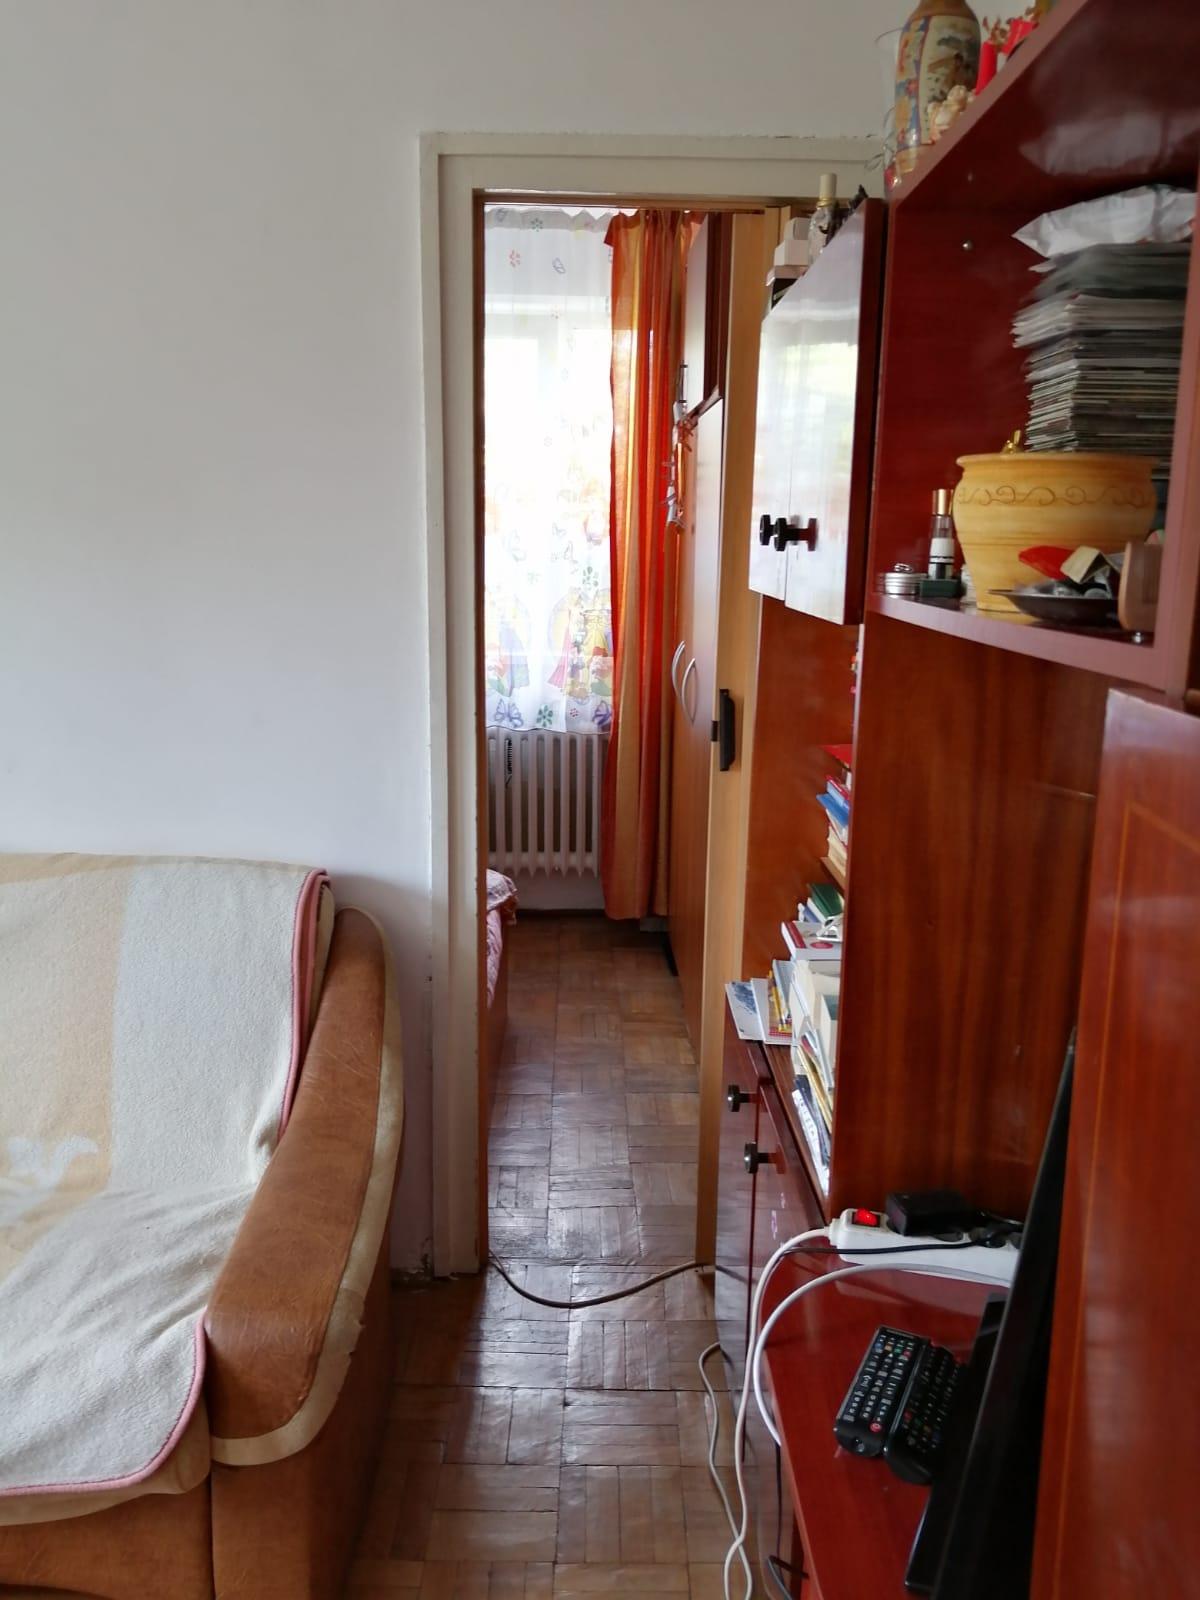 186714-Vanzare apartament  2 camere, Gheorgheni, Cluj-Napoca